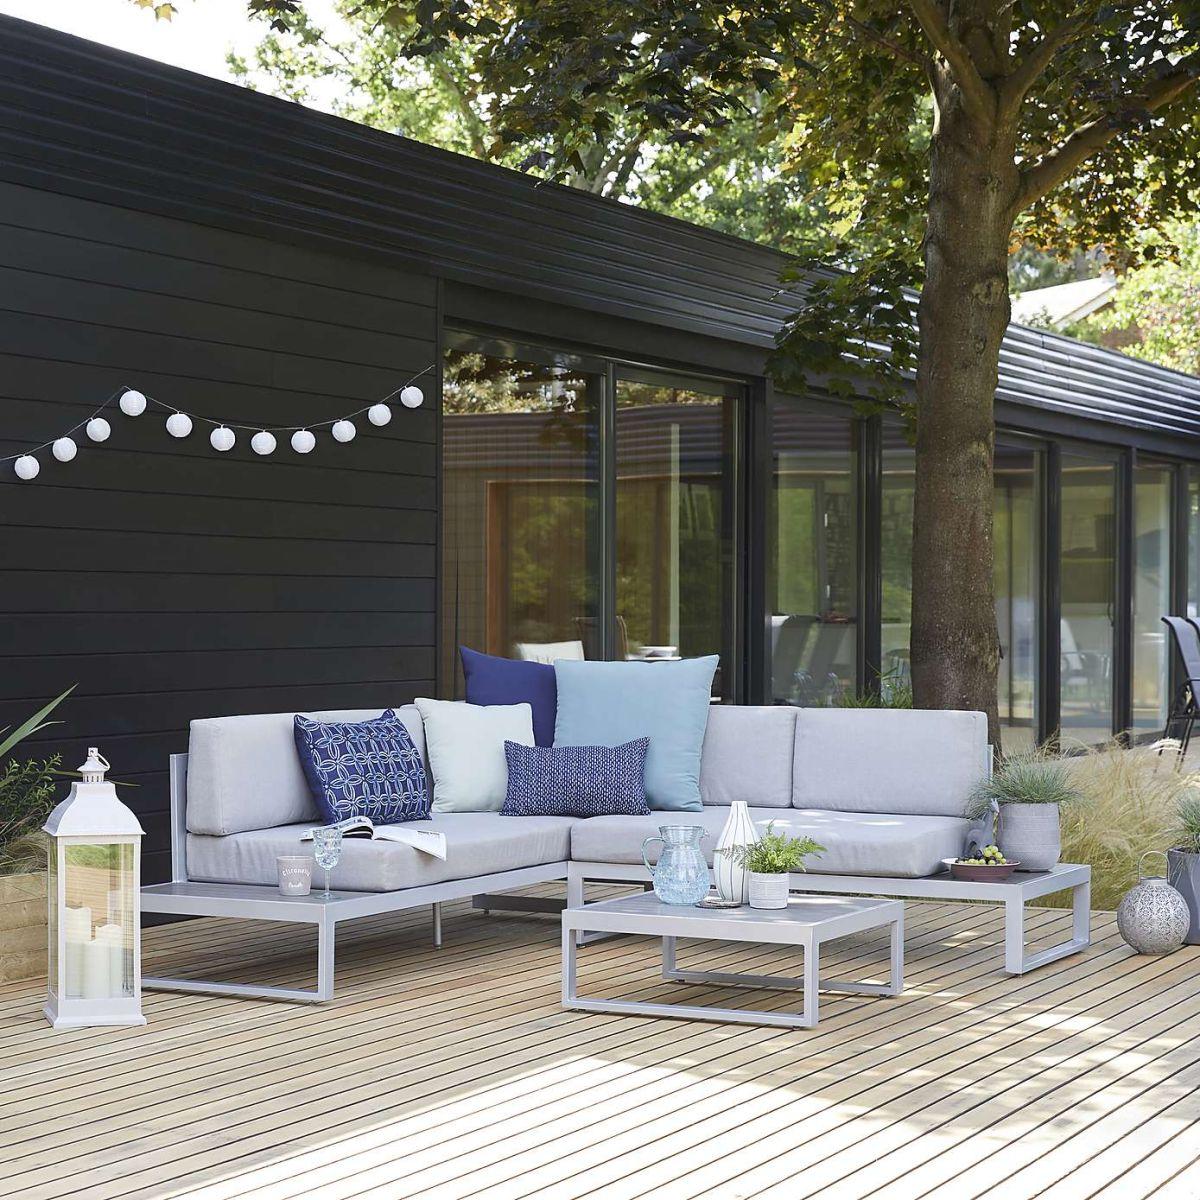 This Dunelm garden furniture is here to make your garden ...